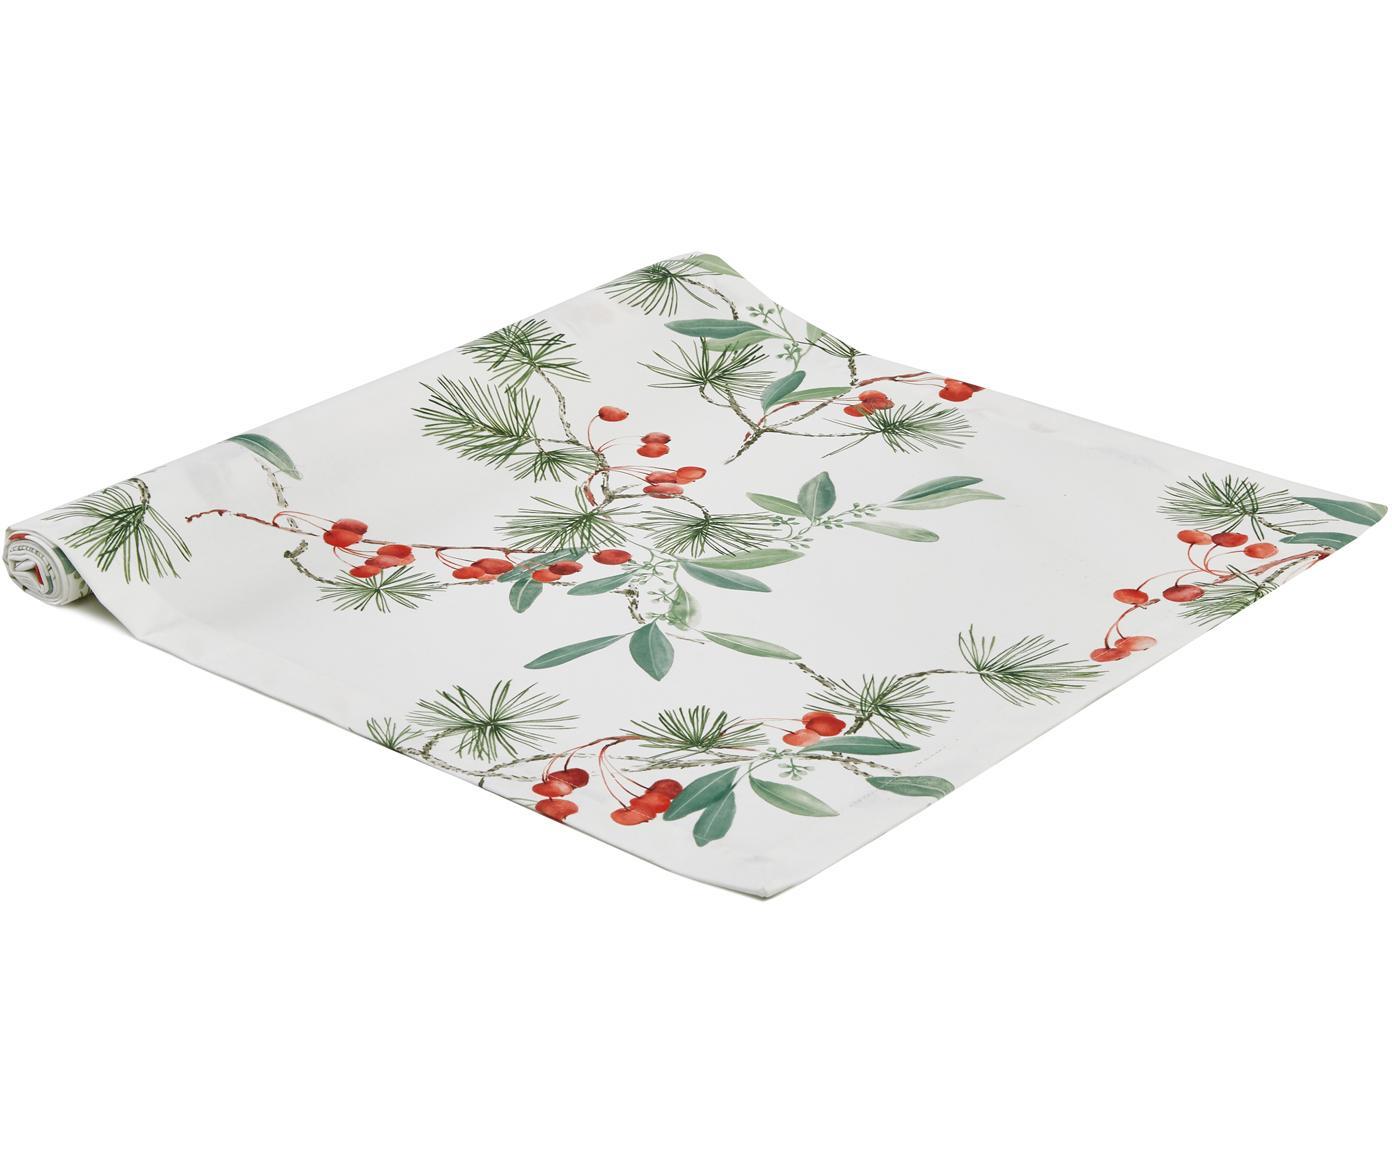 Runner da tavolo Myrta, Cotone, Bianco, verde, rosso, Larg. 50 x Lung. 140 cm